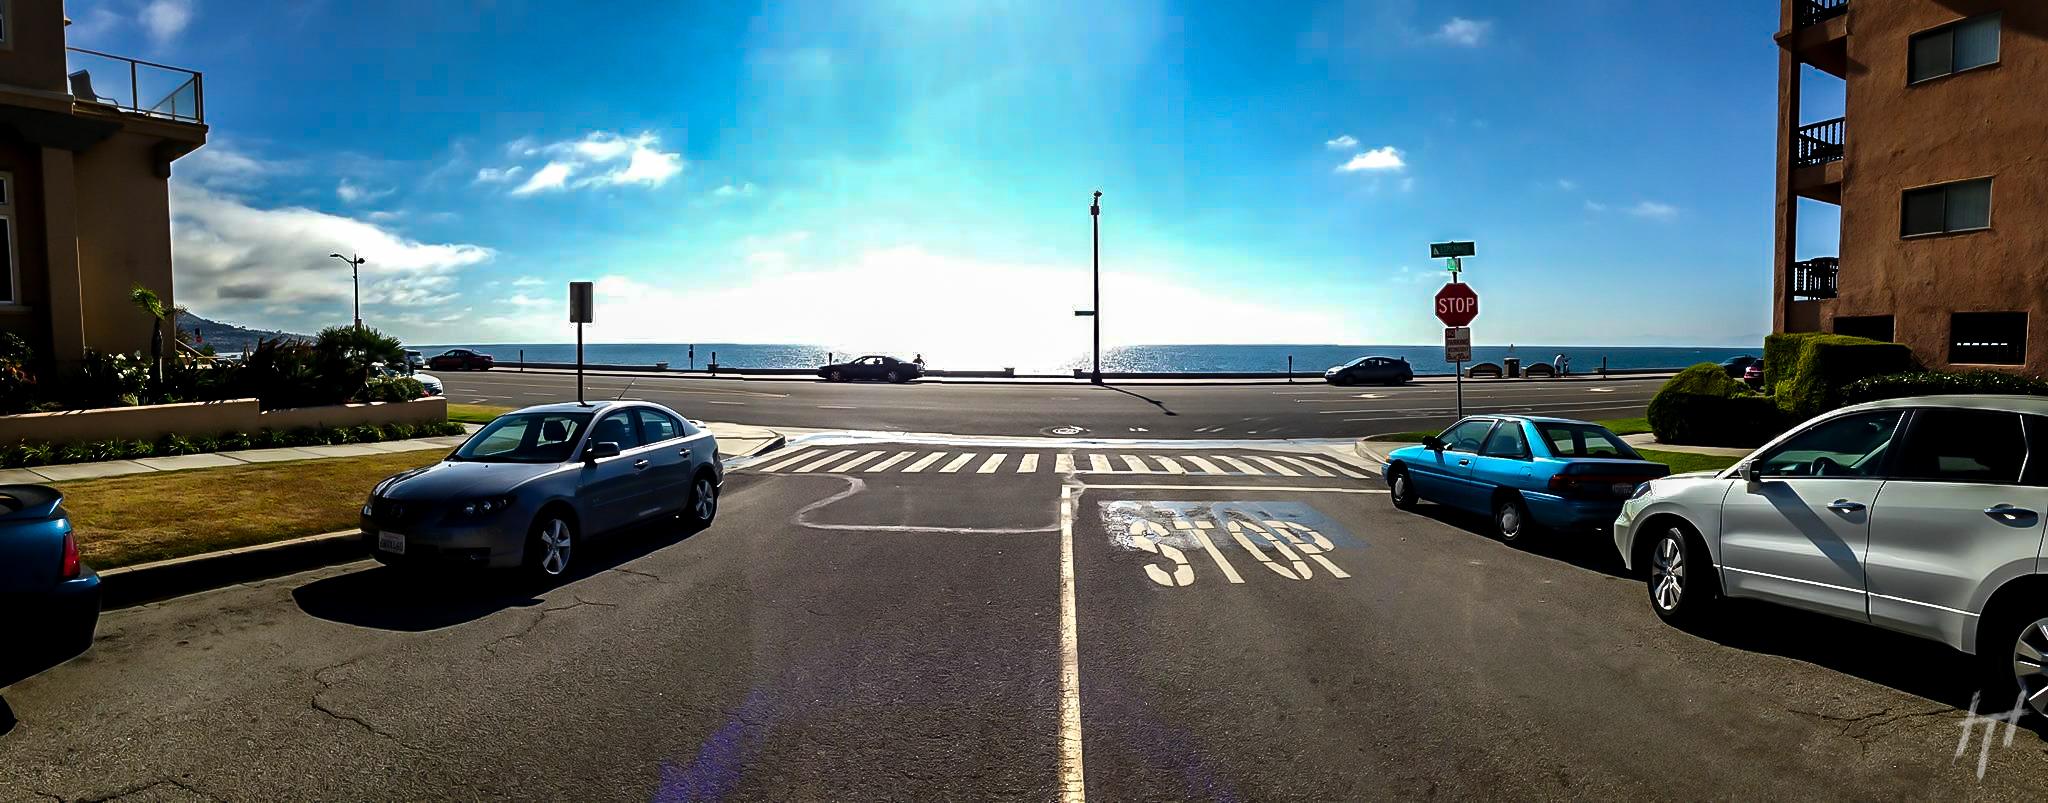 Avenue E.jpg